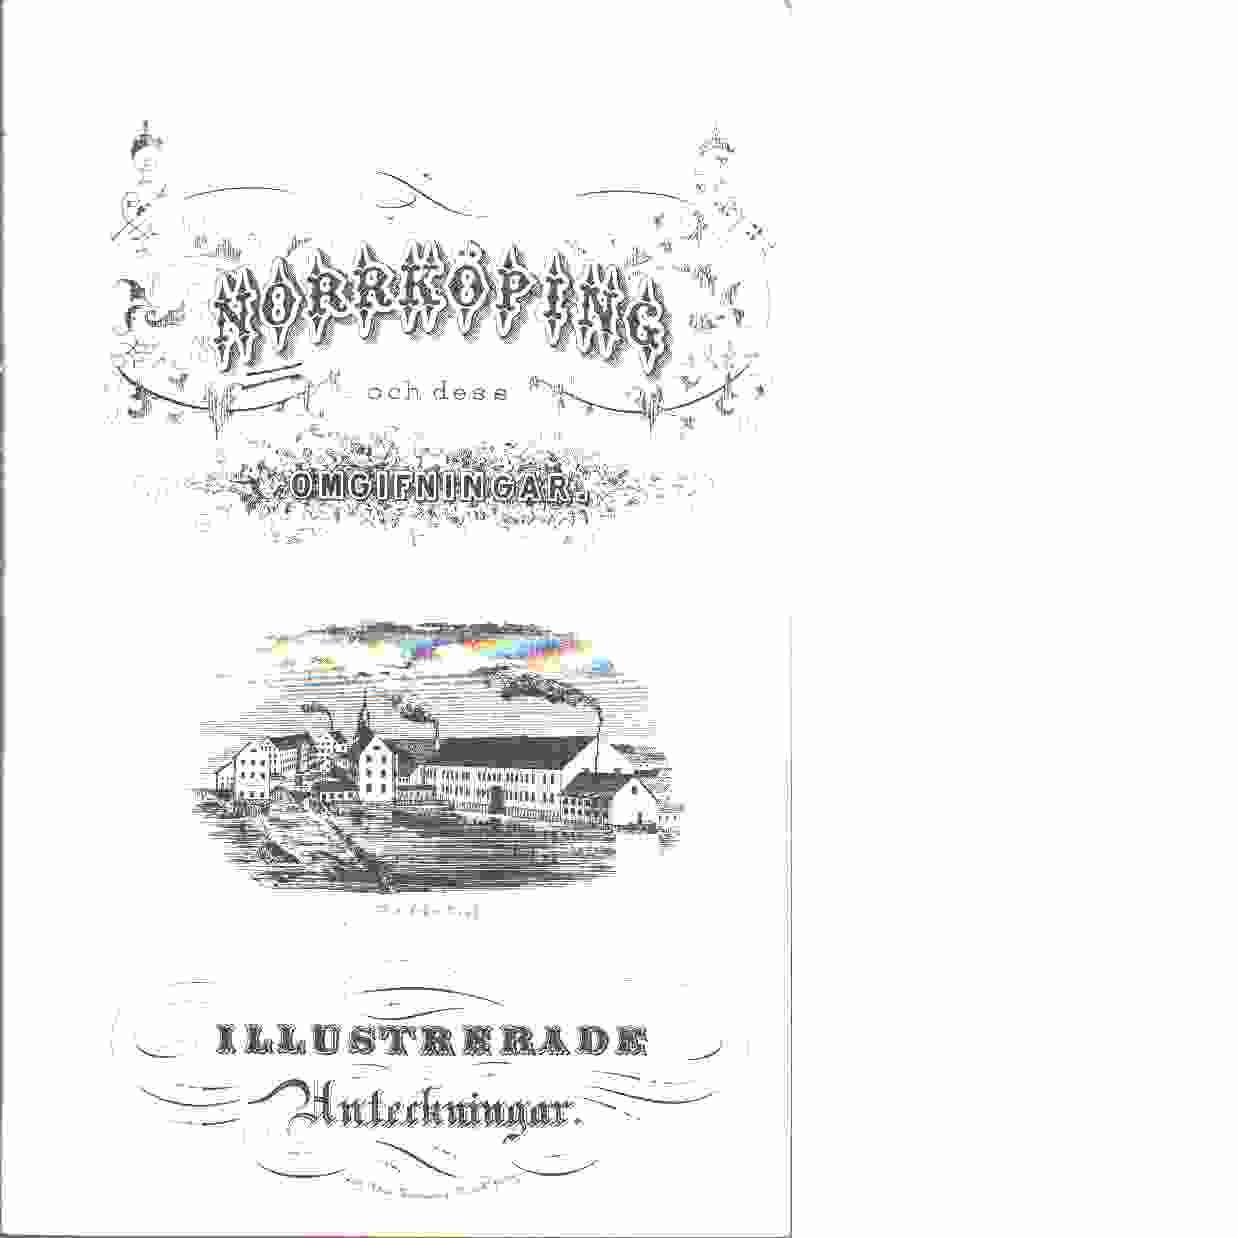 Norrköping och dess omgifningar - Hertzman, Fredrik